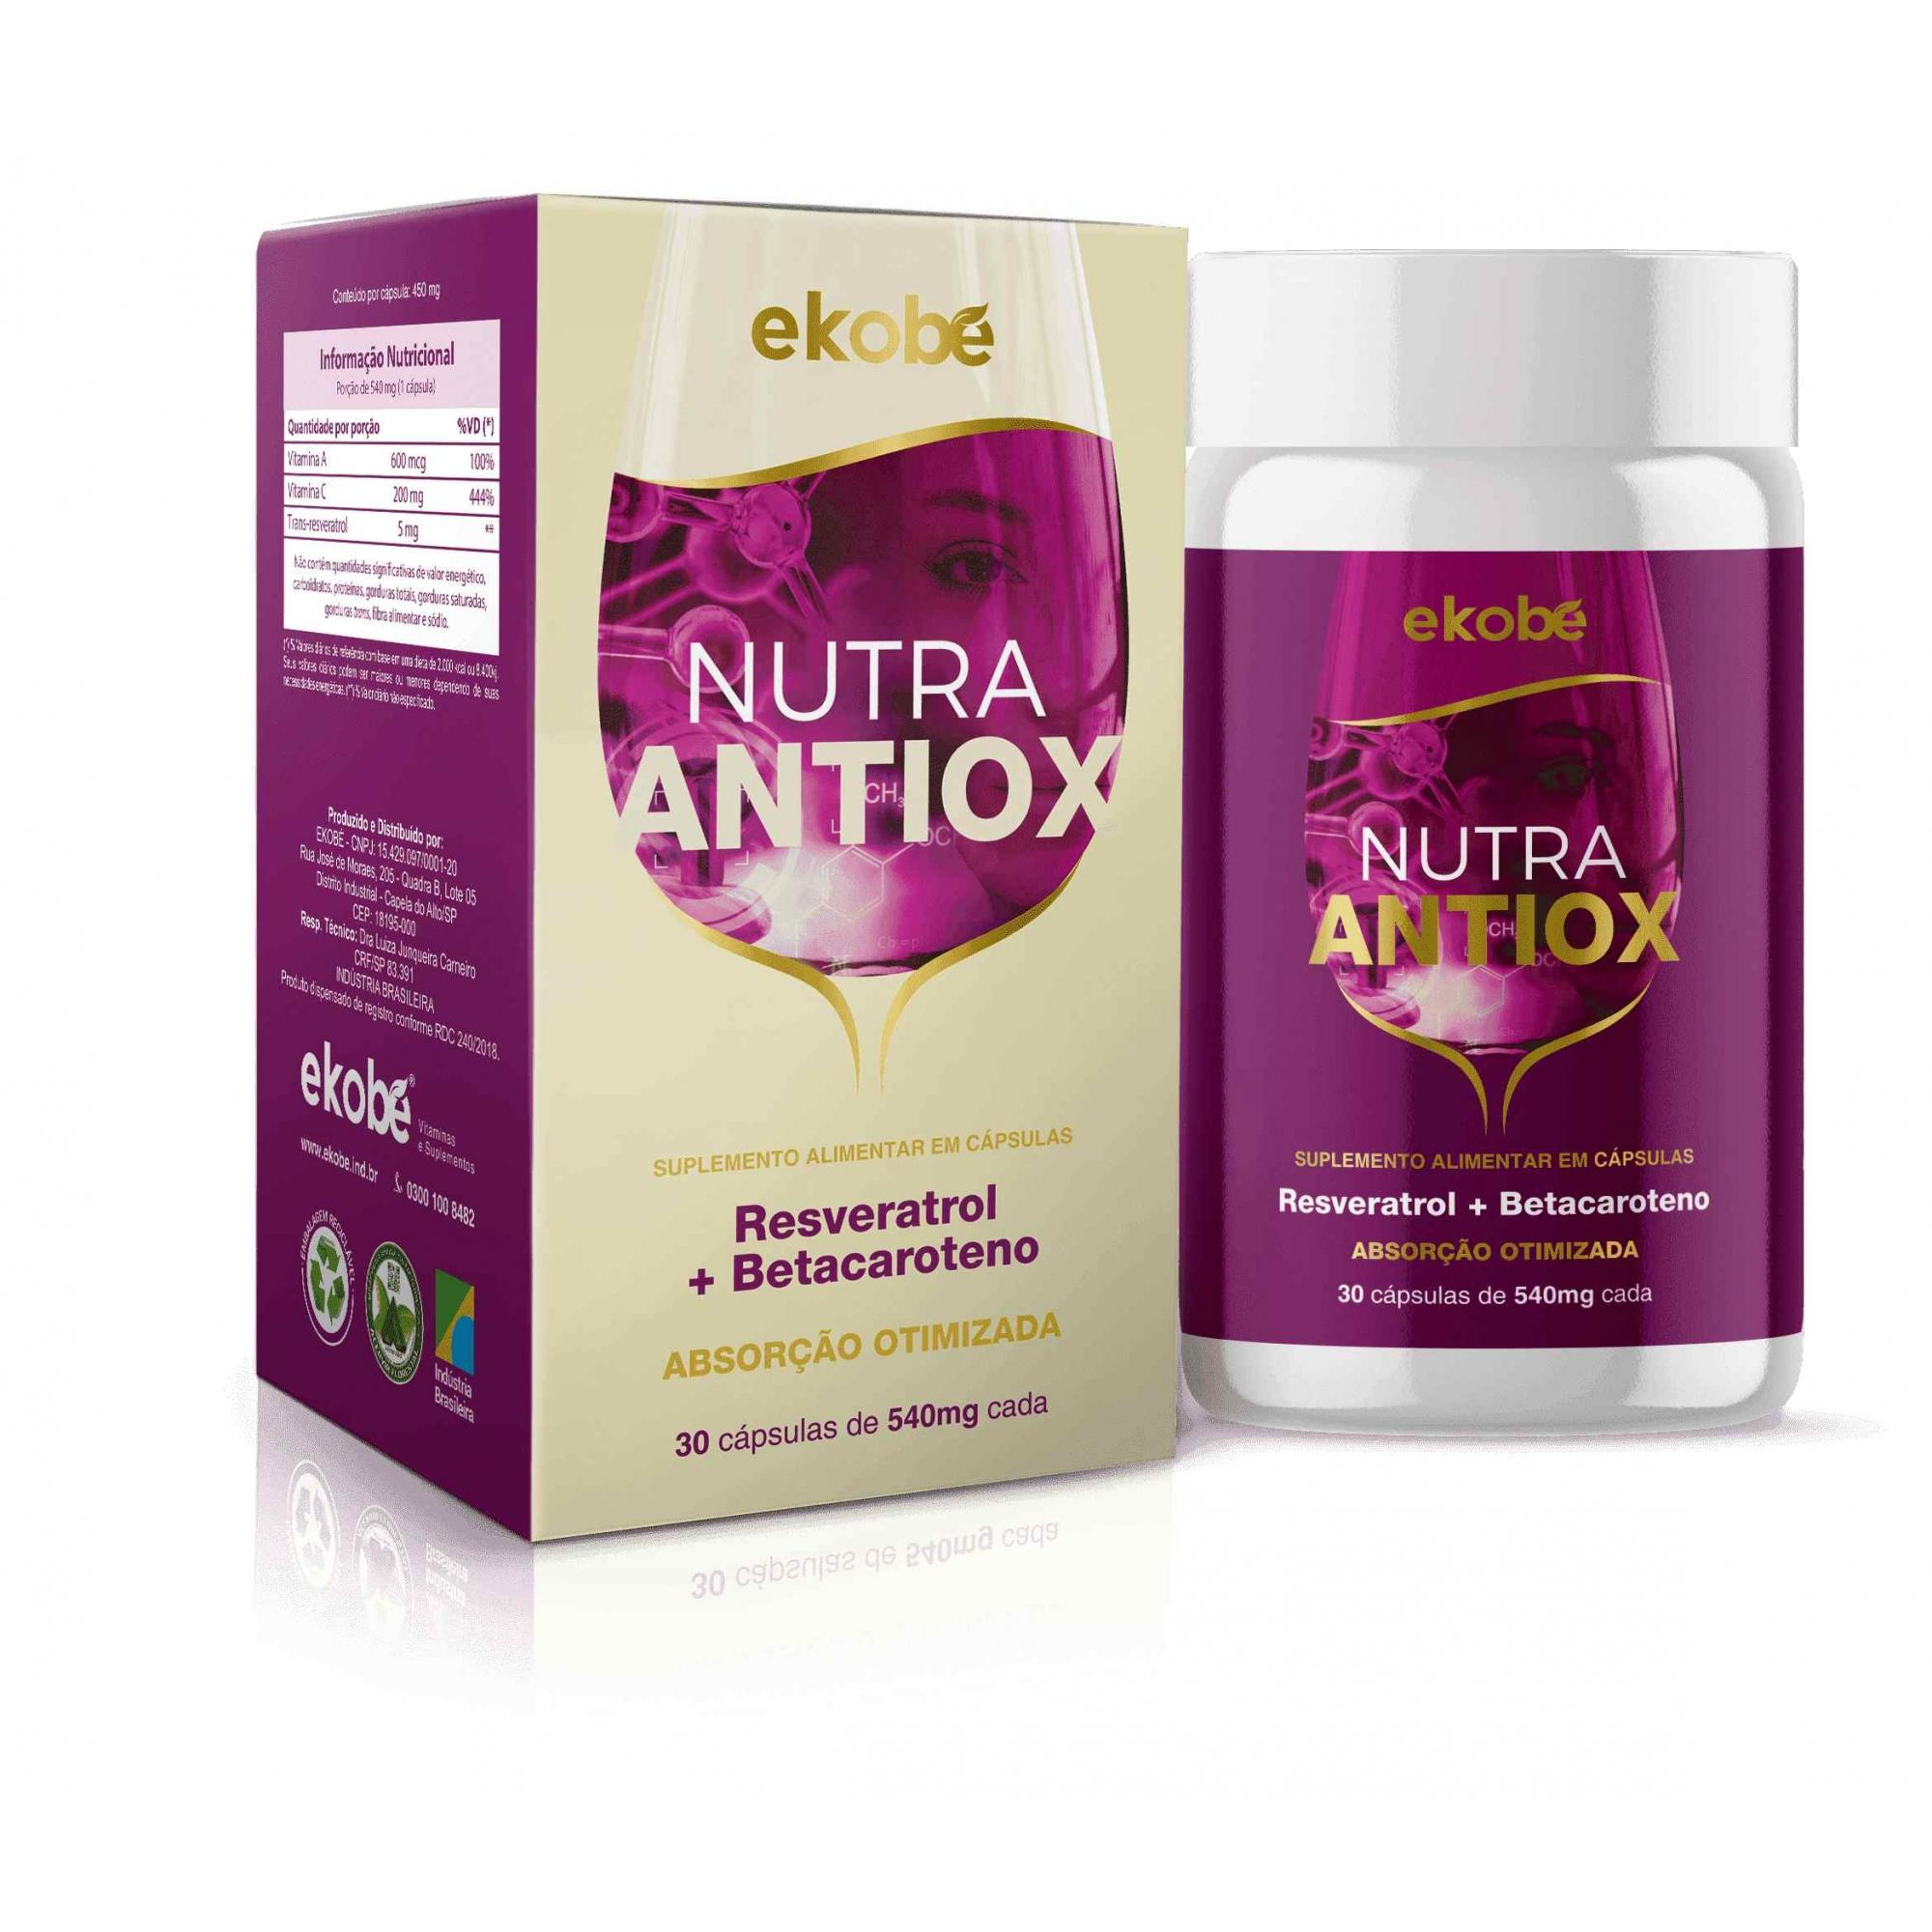 Nutra Antiox